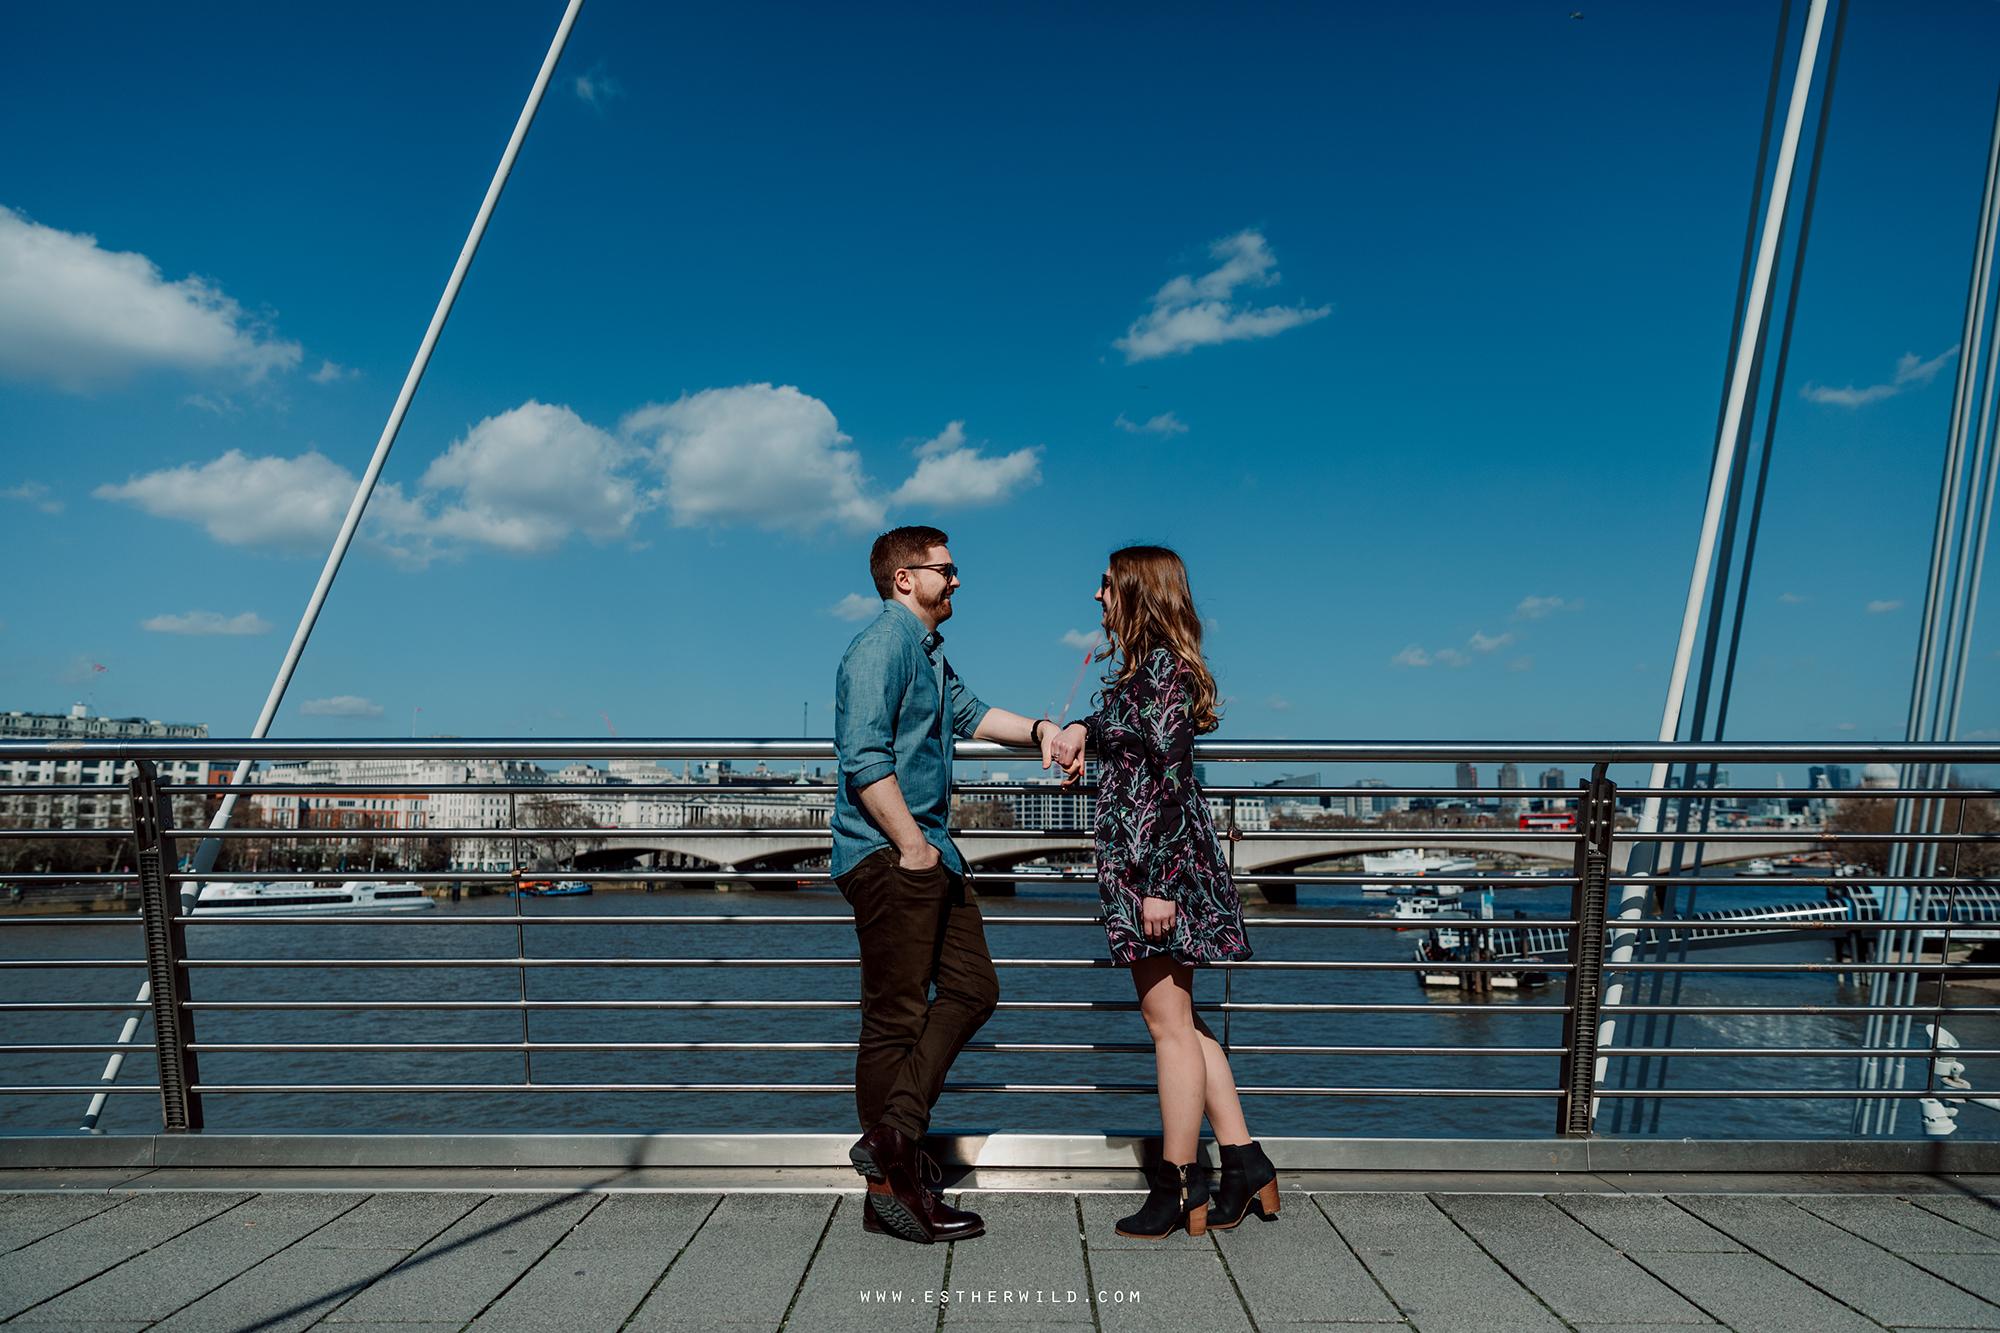 London_Engagement_Session_Pre-Wedding_Photo_Shoot_Esther_Wild_Photographer_IMG_0933.jpg